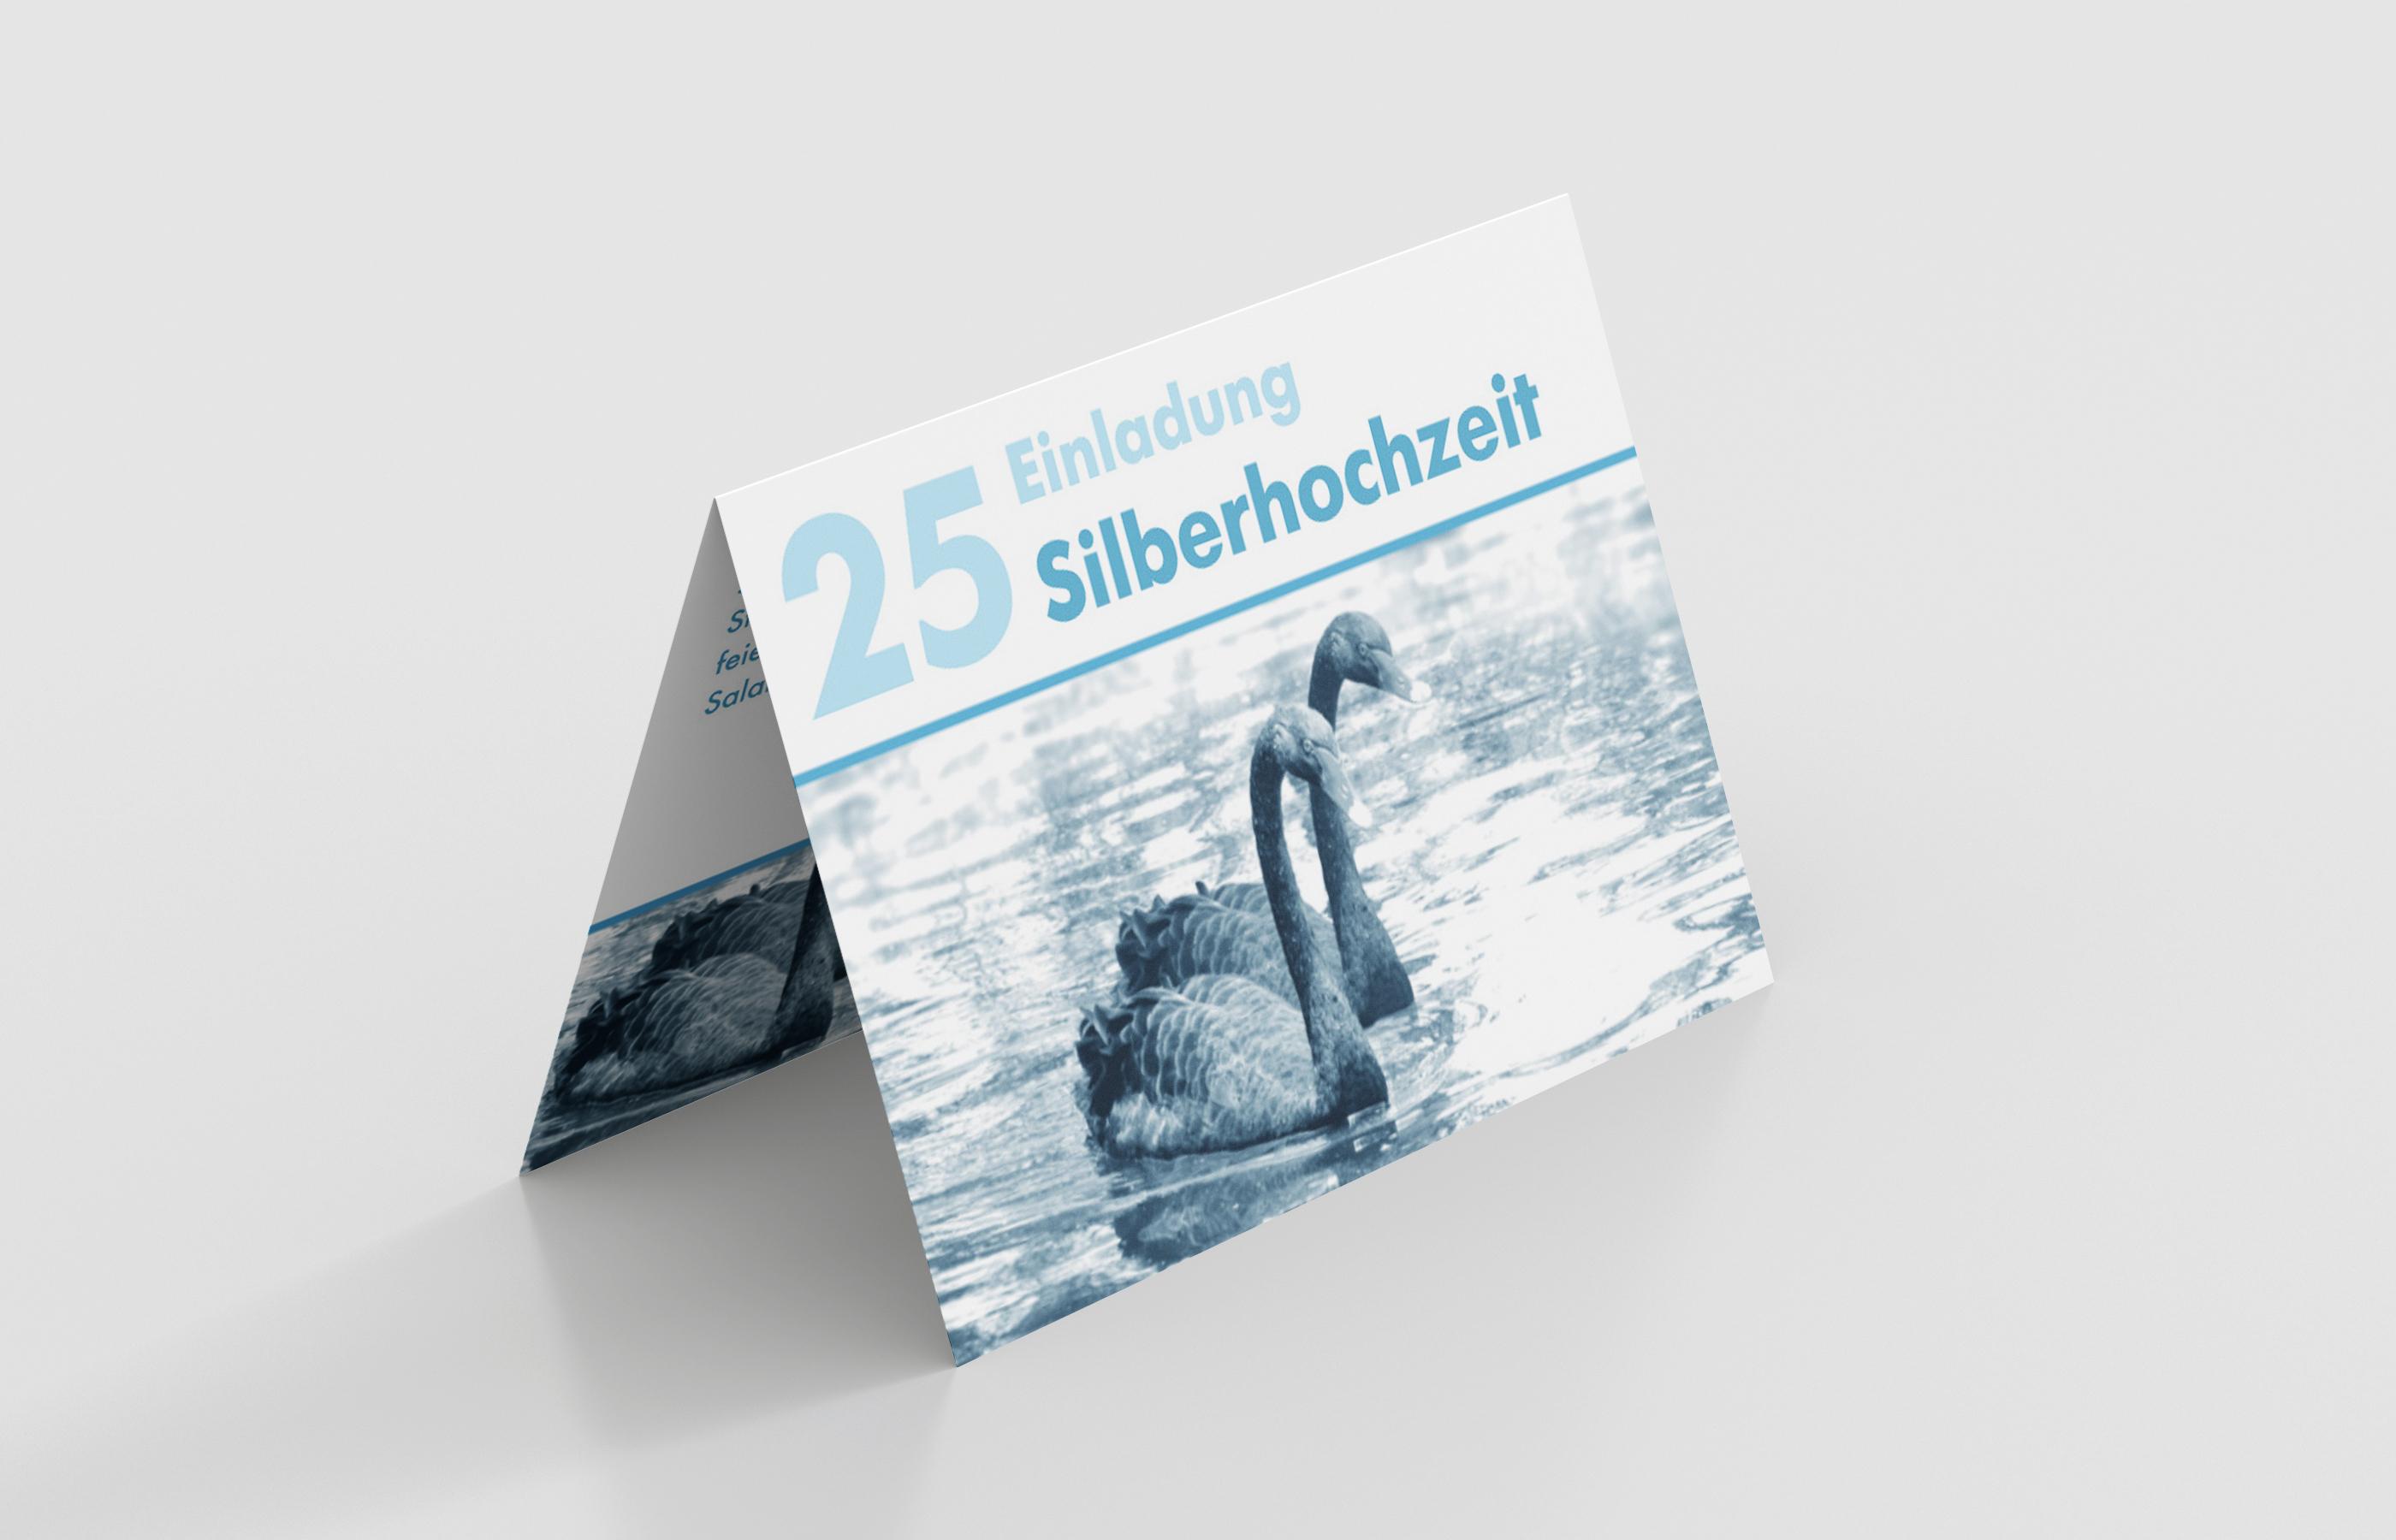 Einladungskarte Silberhochzeit Schwanenpaar